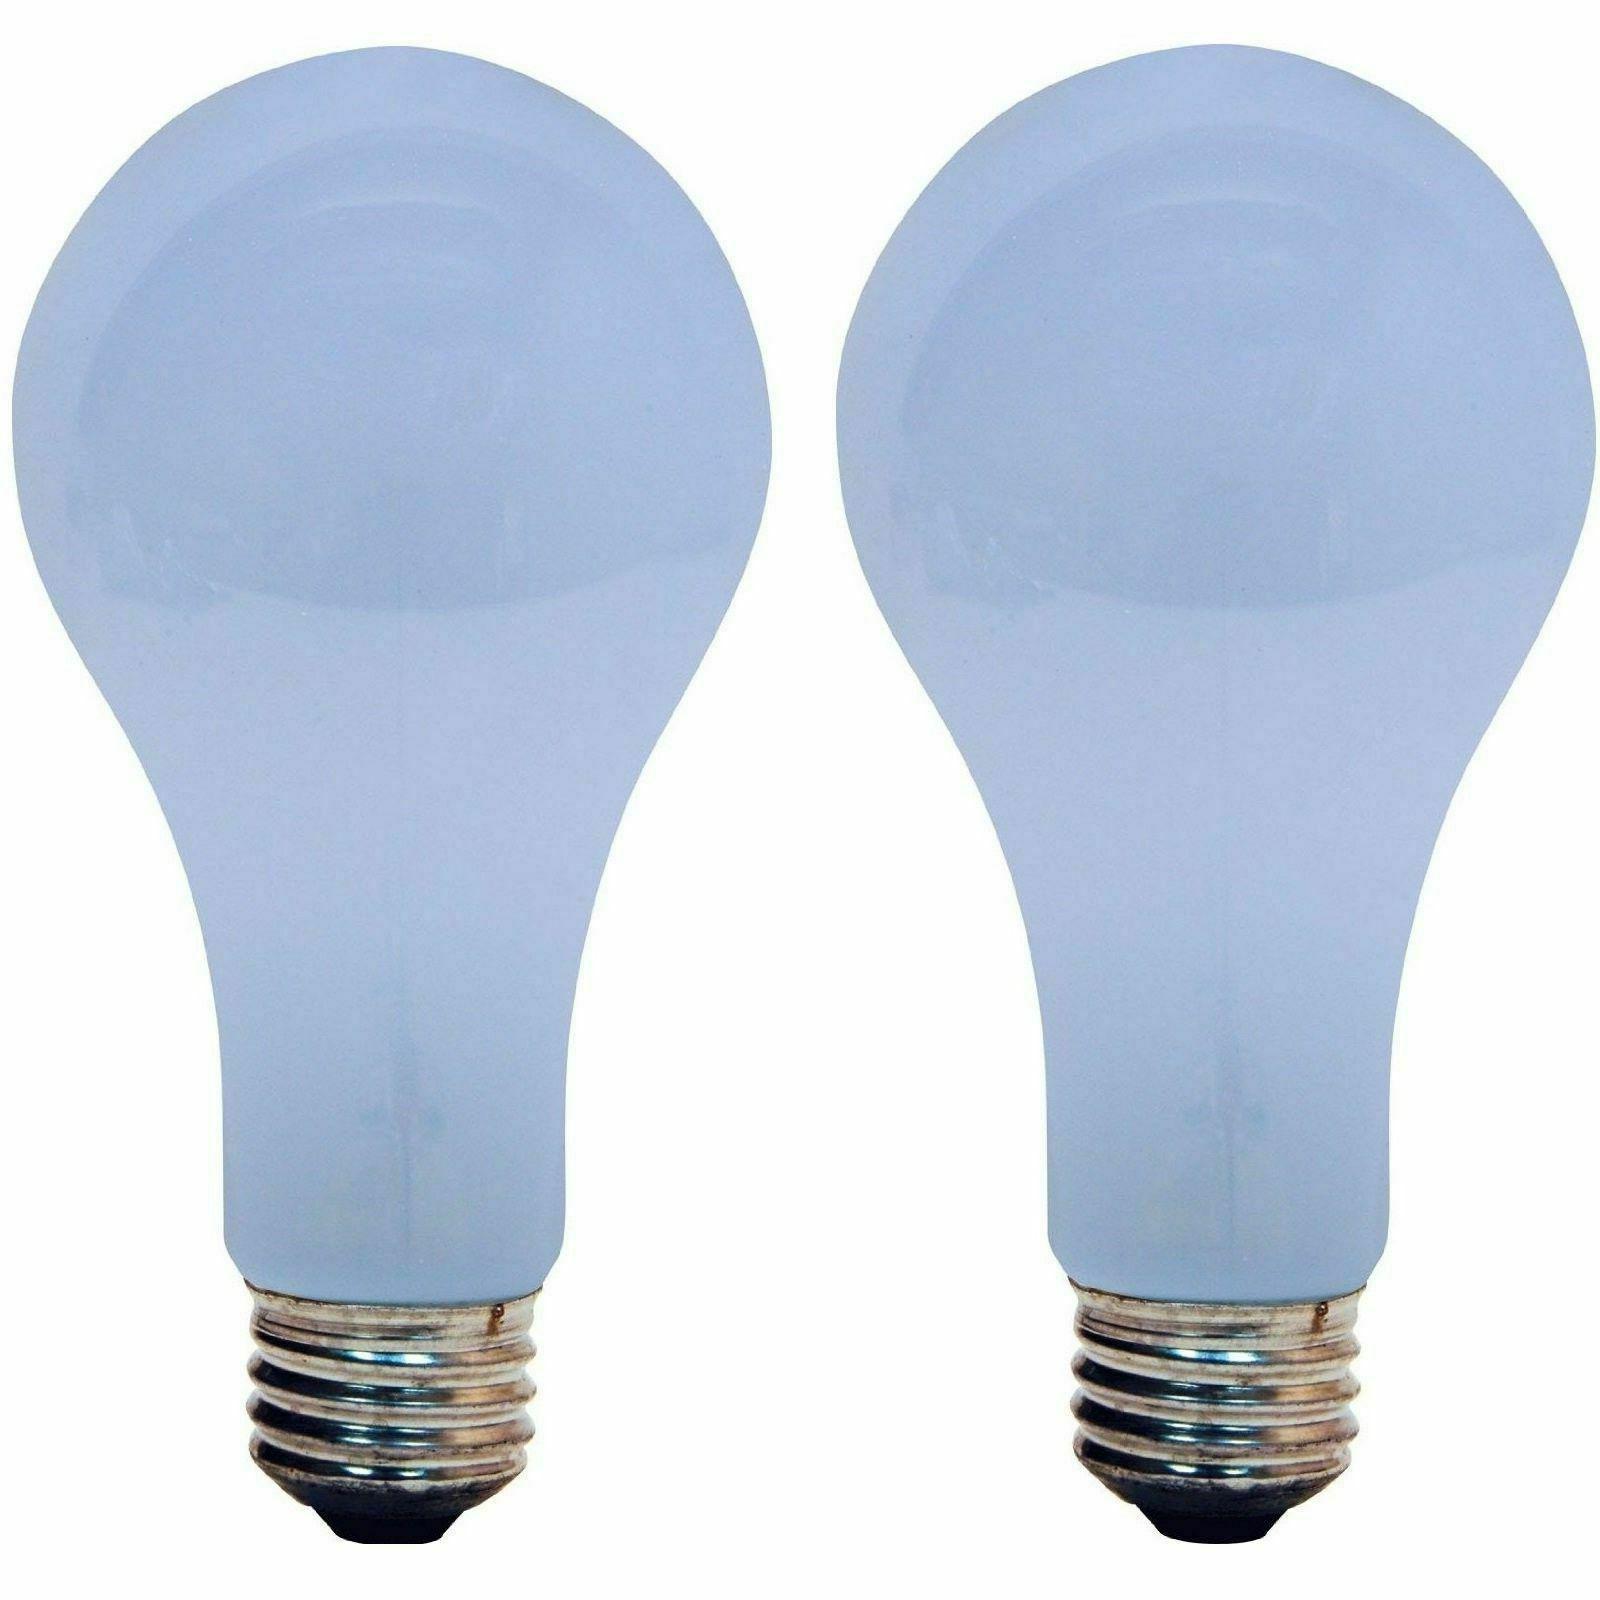 2 GE 97785 50/100/150-Watt A21 3-Way Reveal Light 2